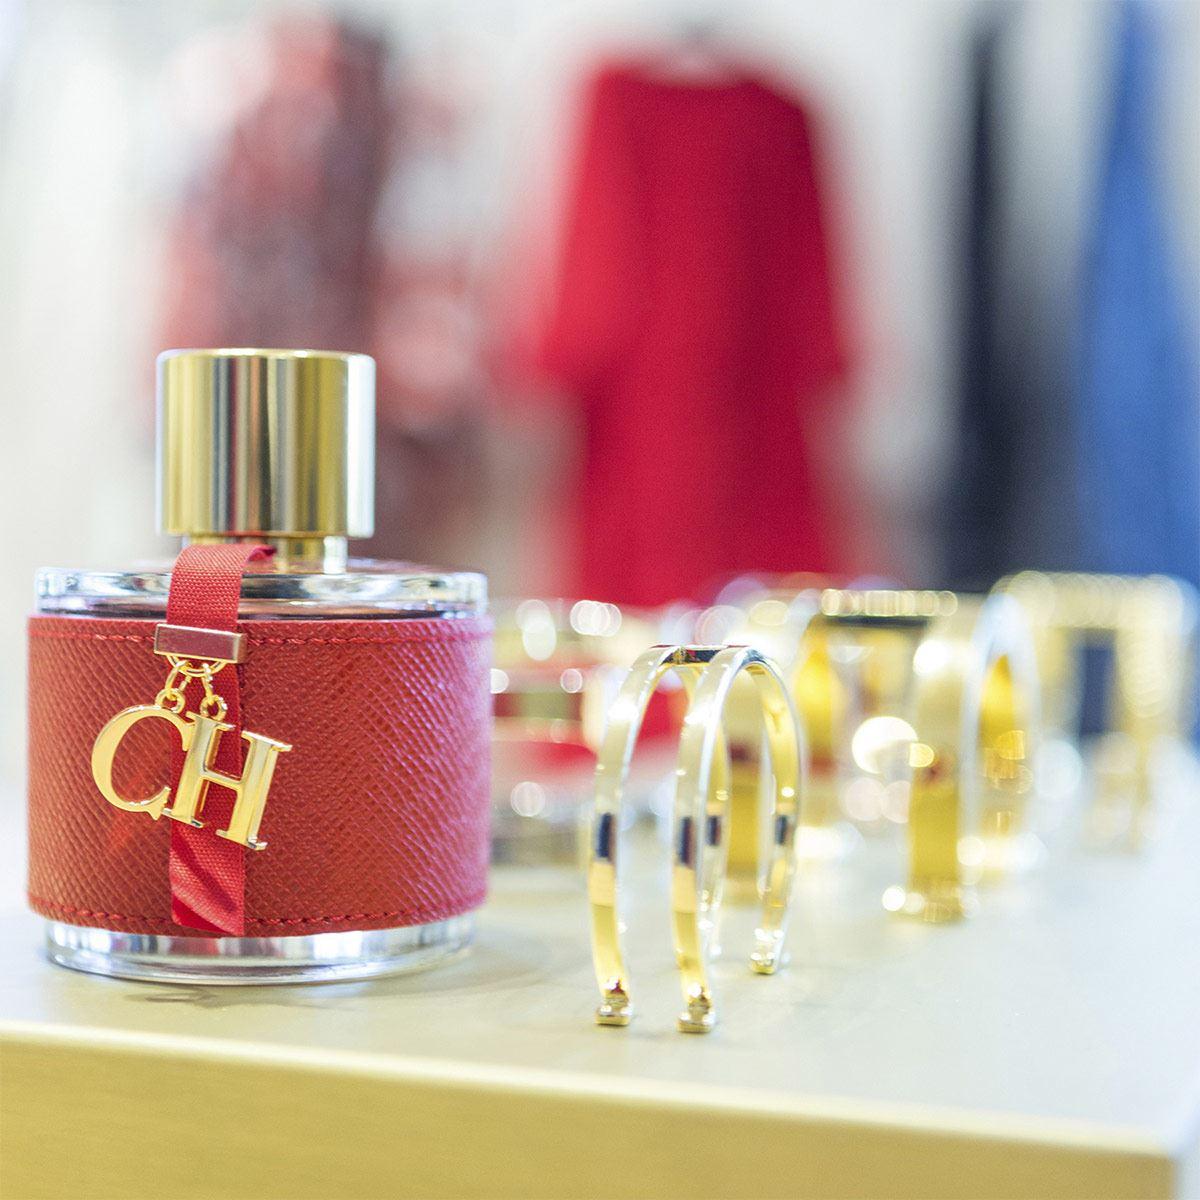 Set para dama, Carolina Herrera, CH, EDT 100 ML + Body lotion 100ML